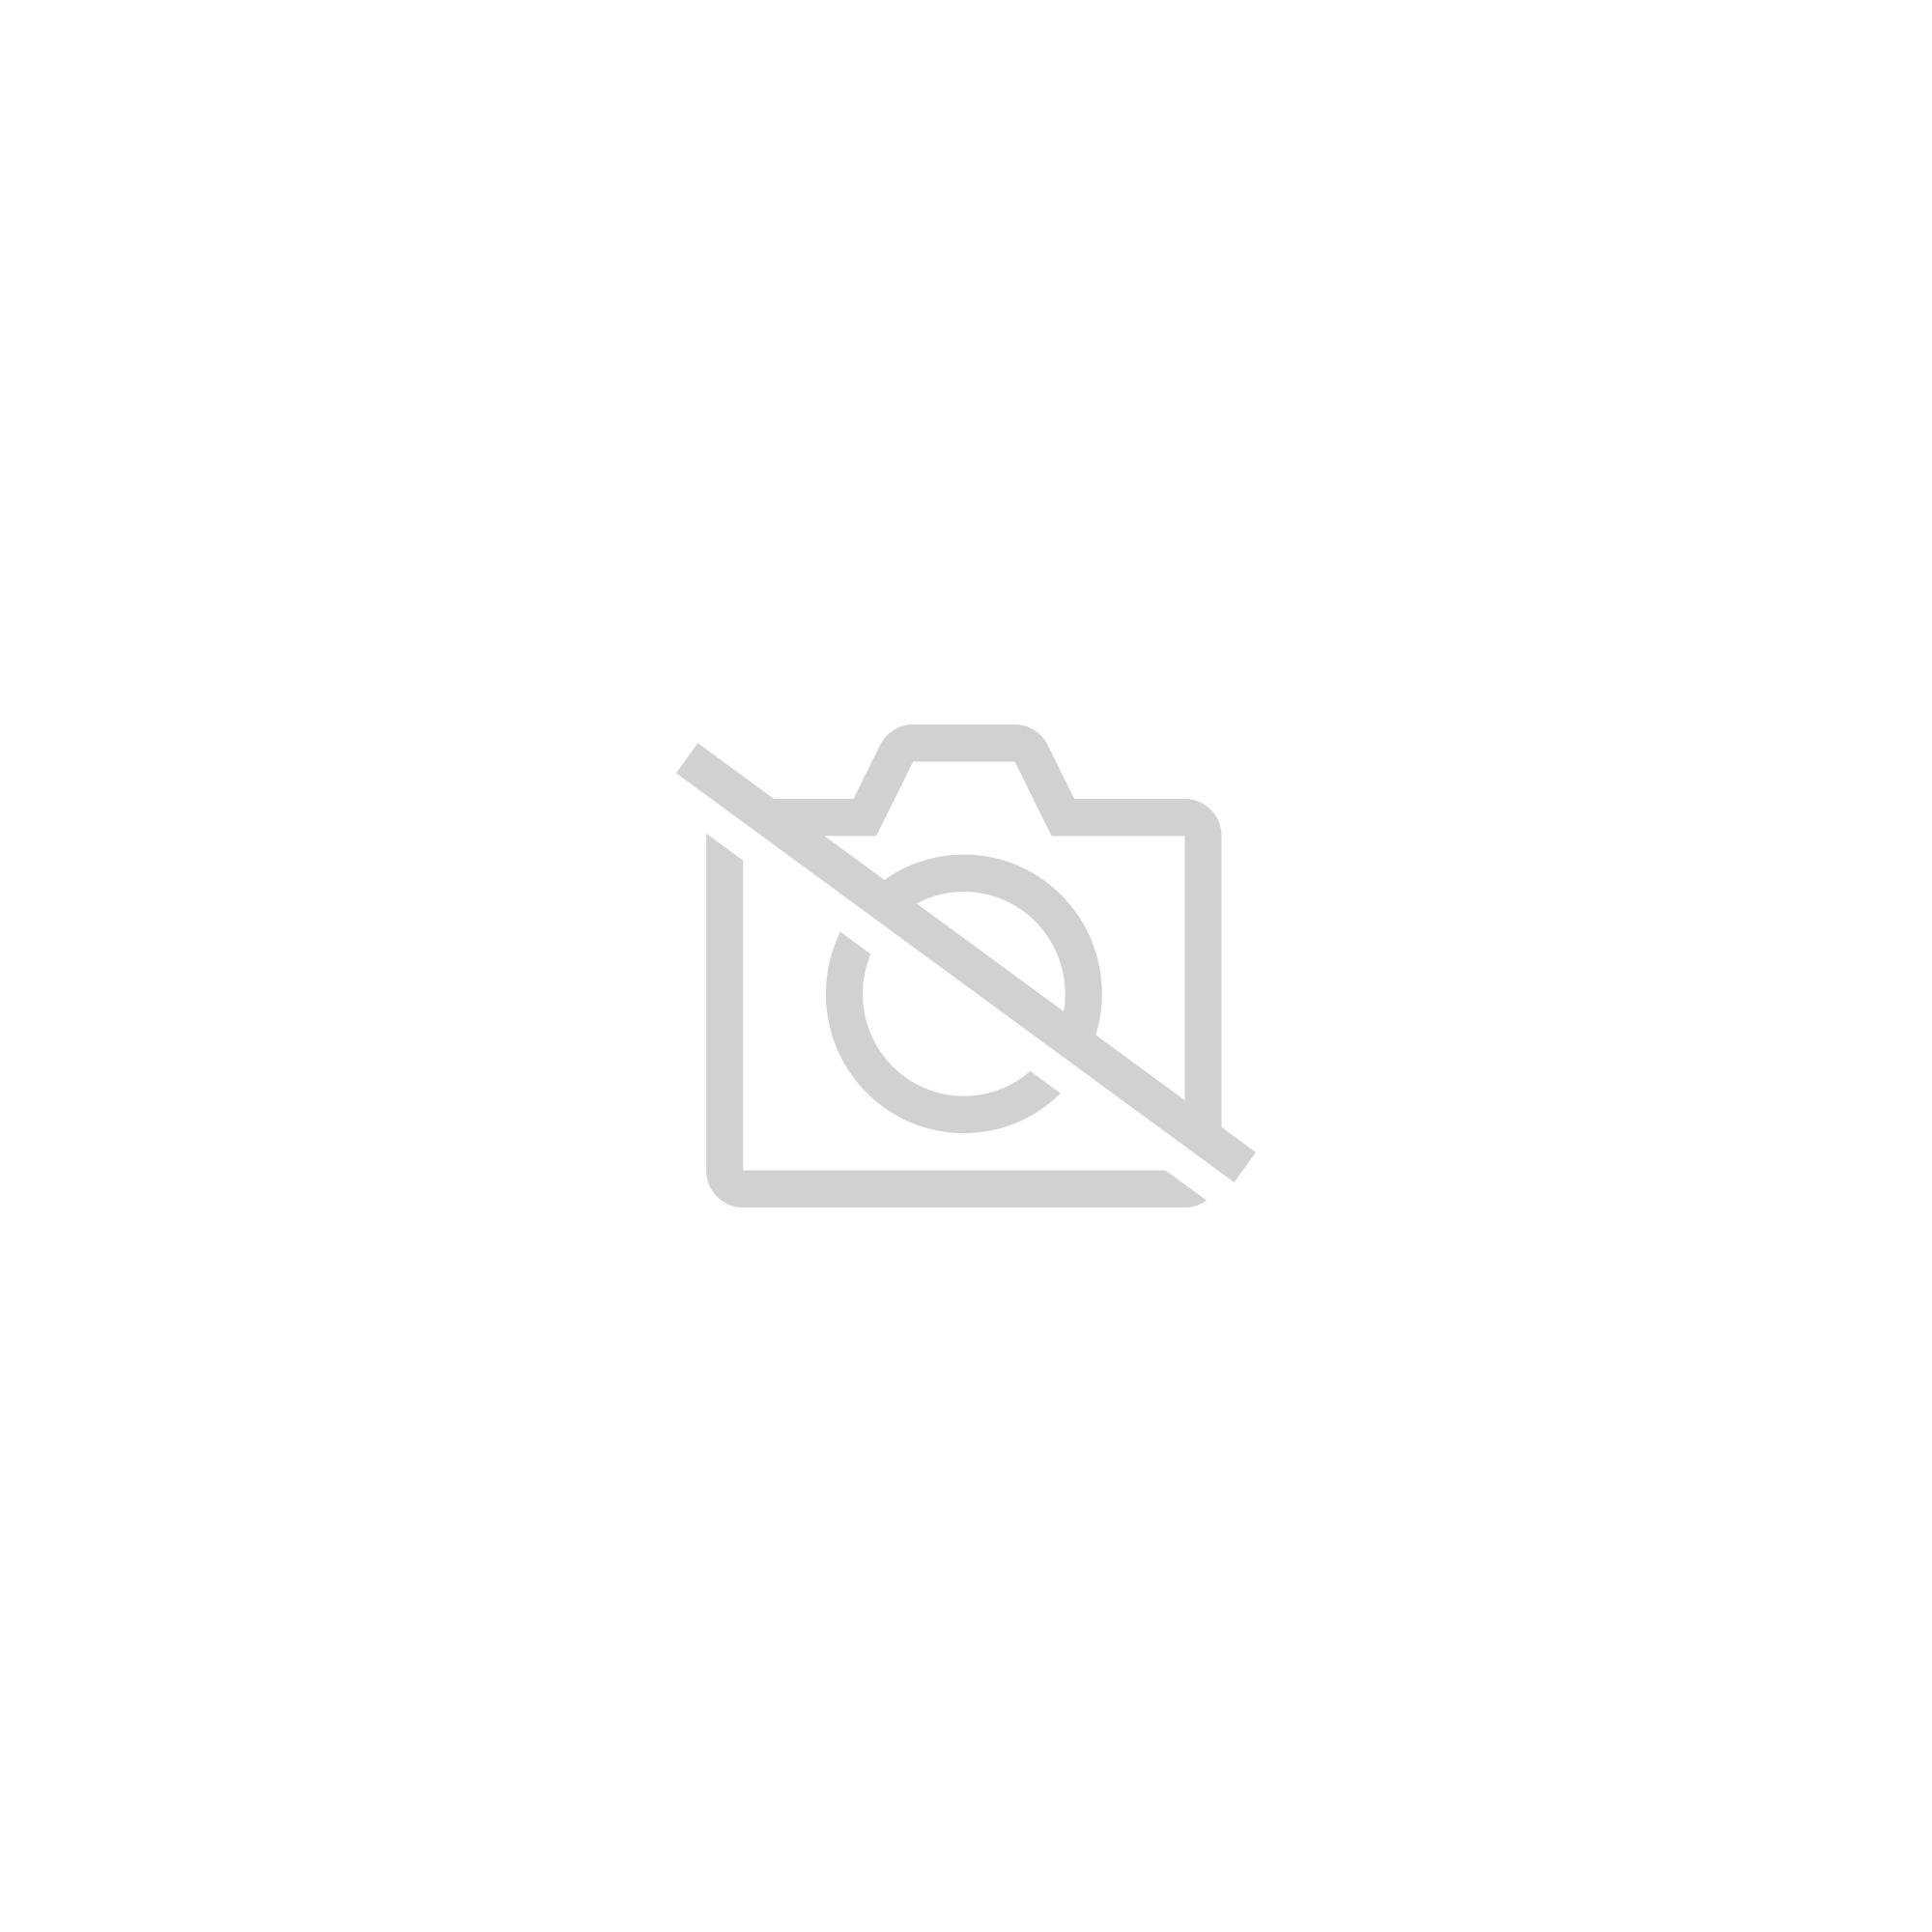 Peugeot 404 Break 1964 Grise 1/43 Ixo Altaya Kombi Combi Grey Vitre